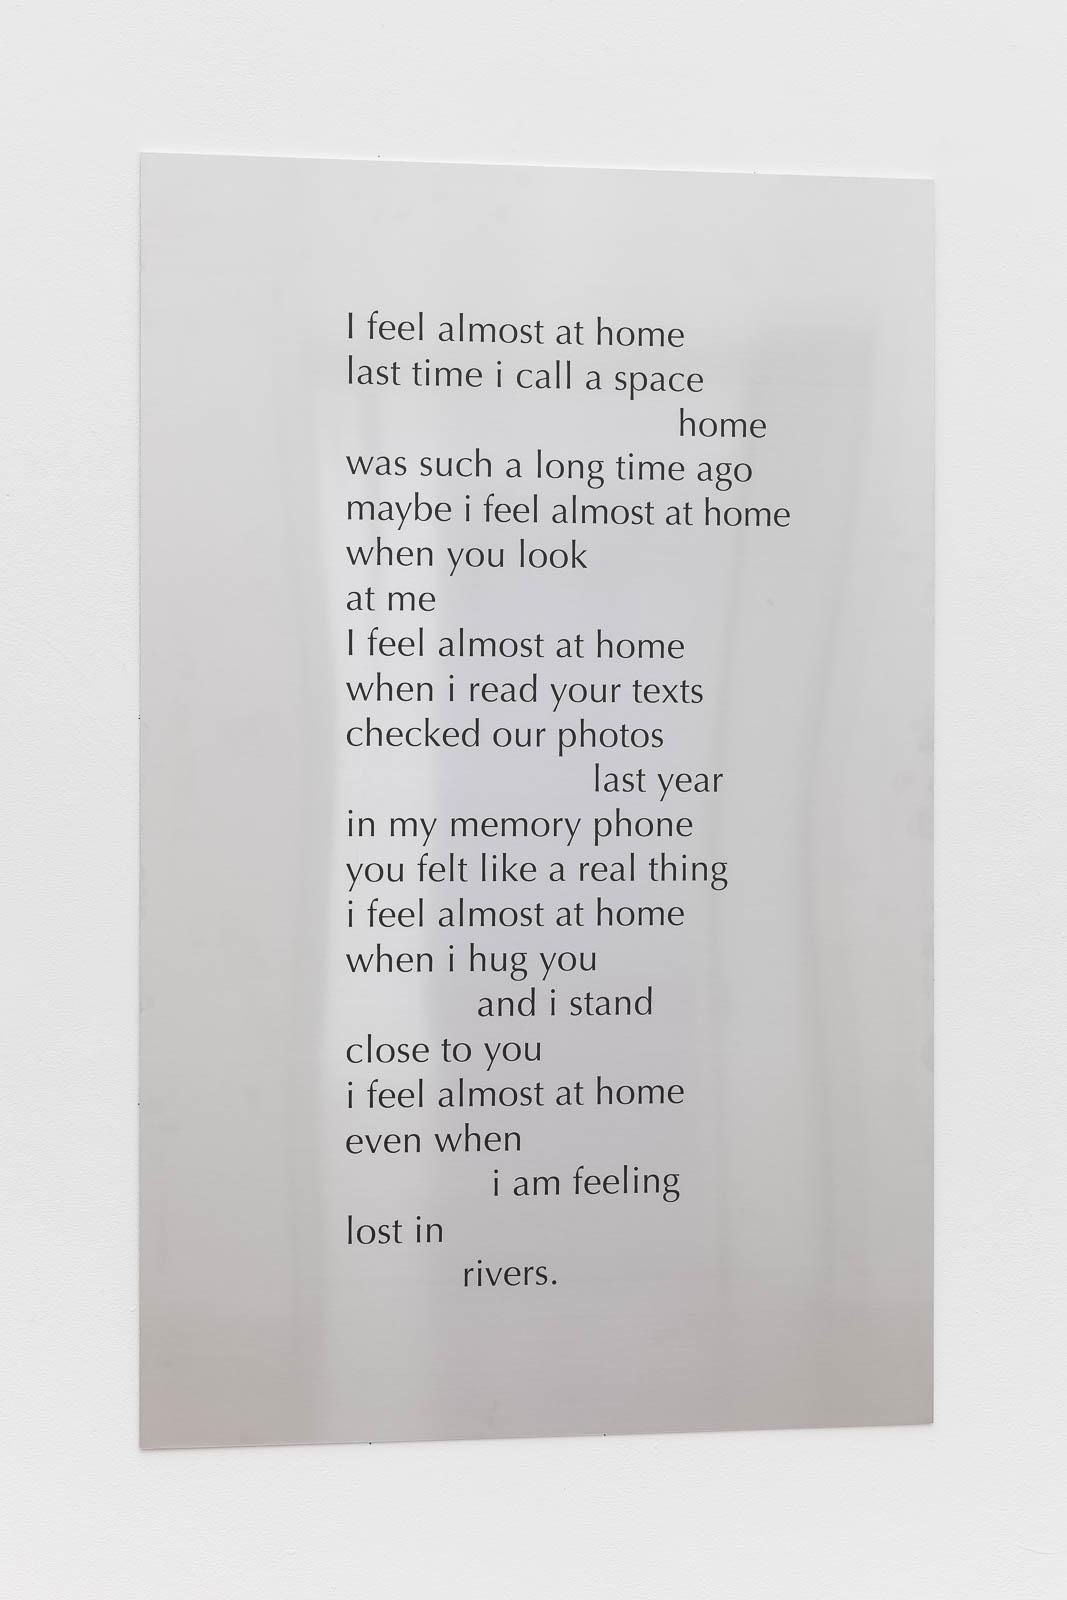 Tarek Lakhrissi, Home, 2021. Aluminium. 110 x 70 x 0.5 cm. Photographer: Mark Blower.